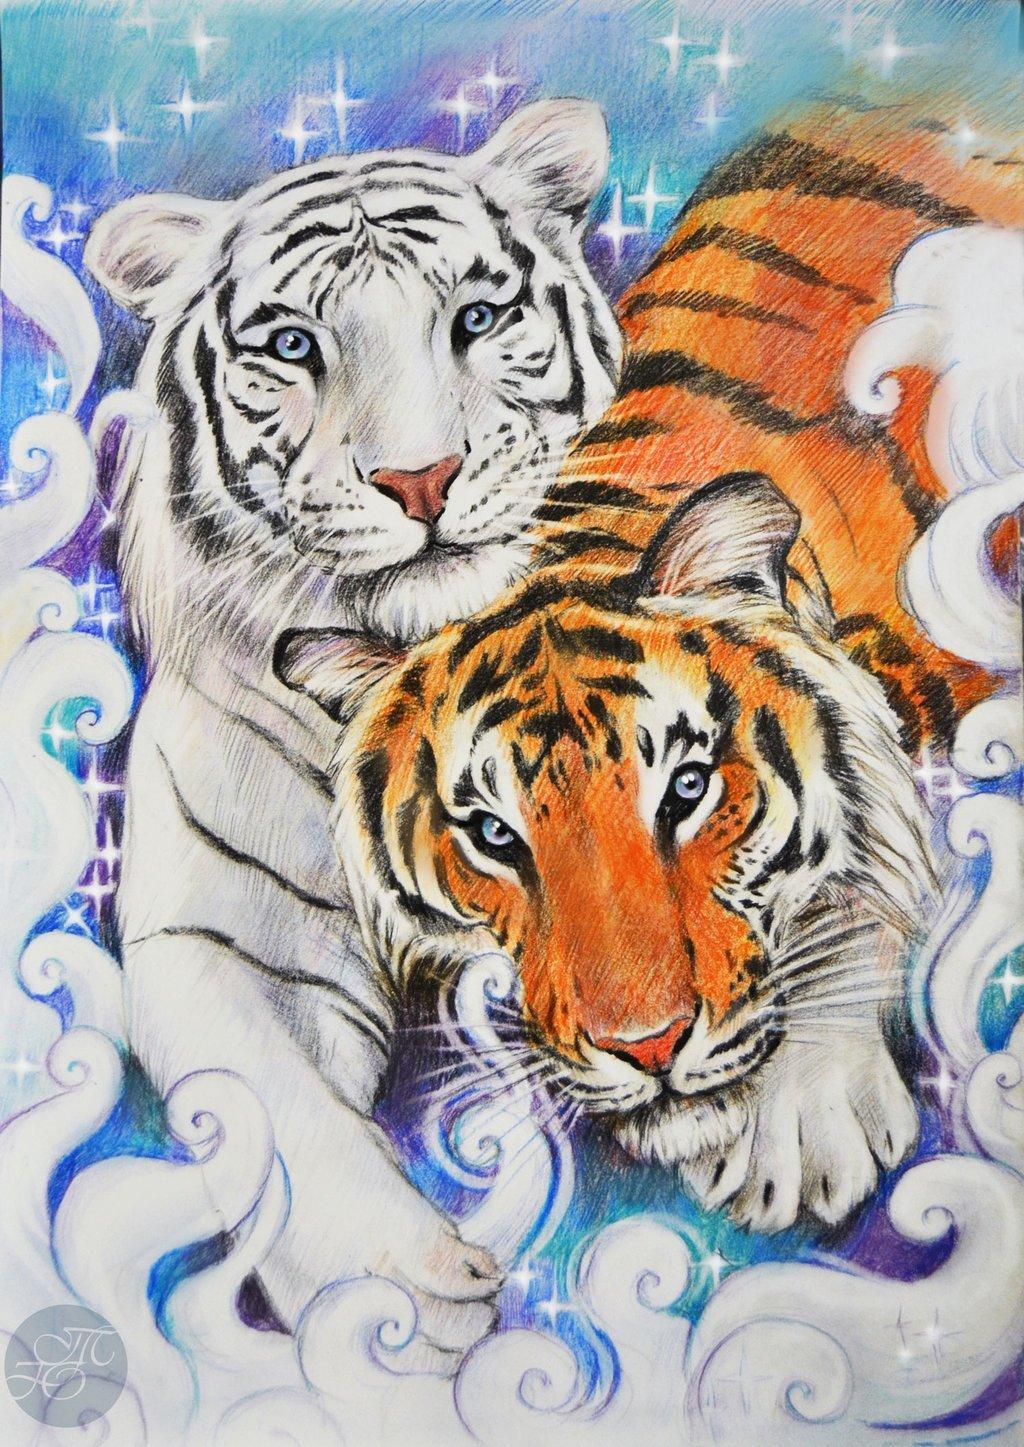 картинки тигров и тигрят карандашом рассказывал журналистам, что